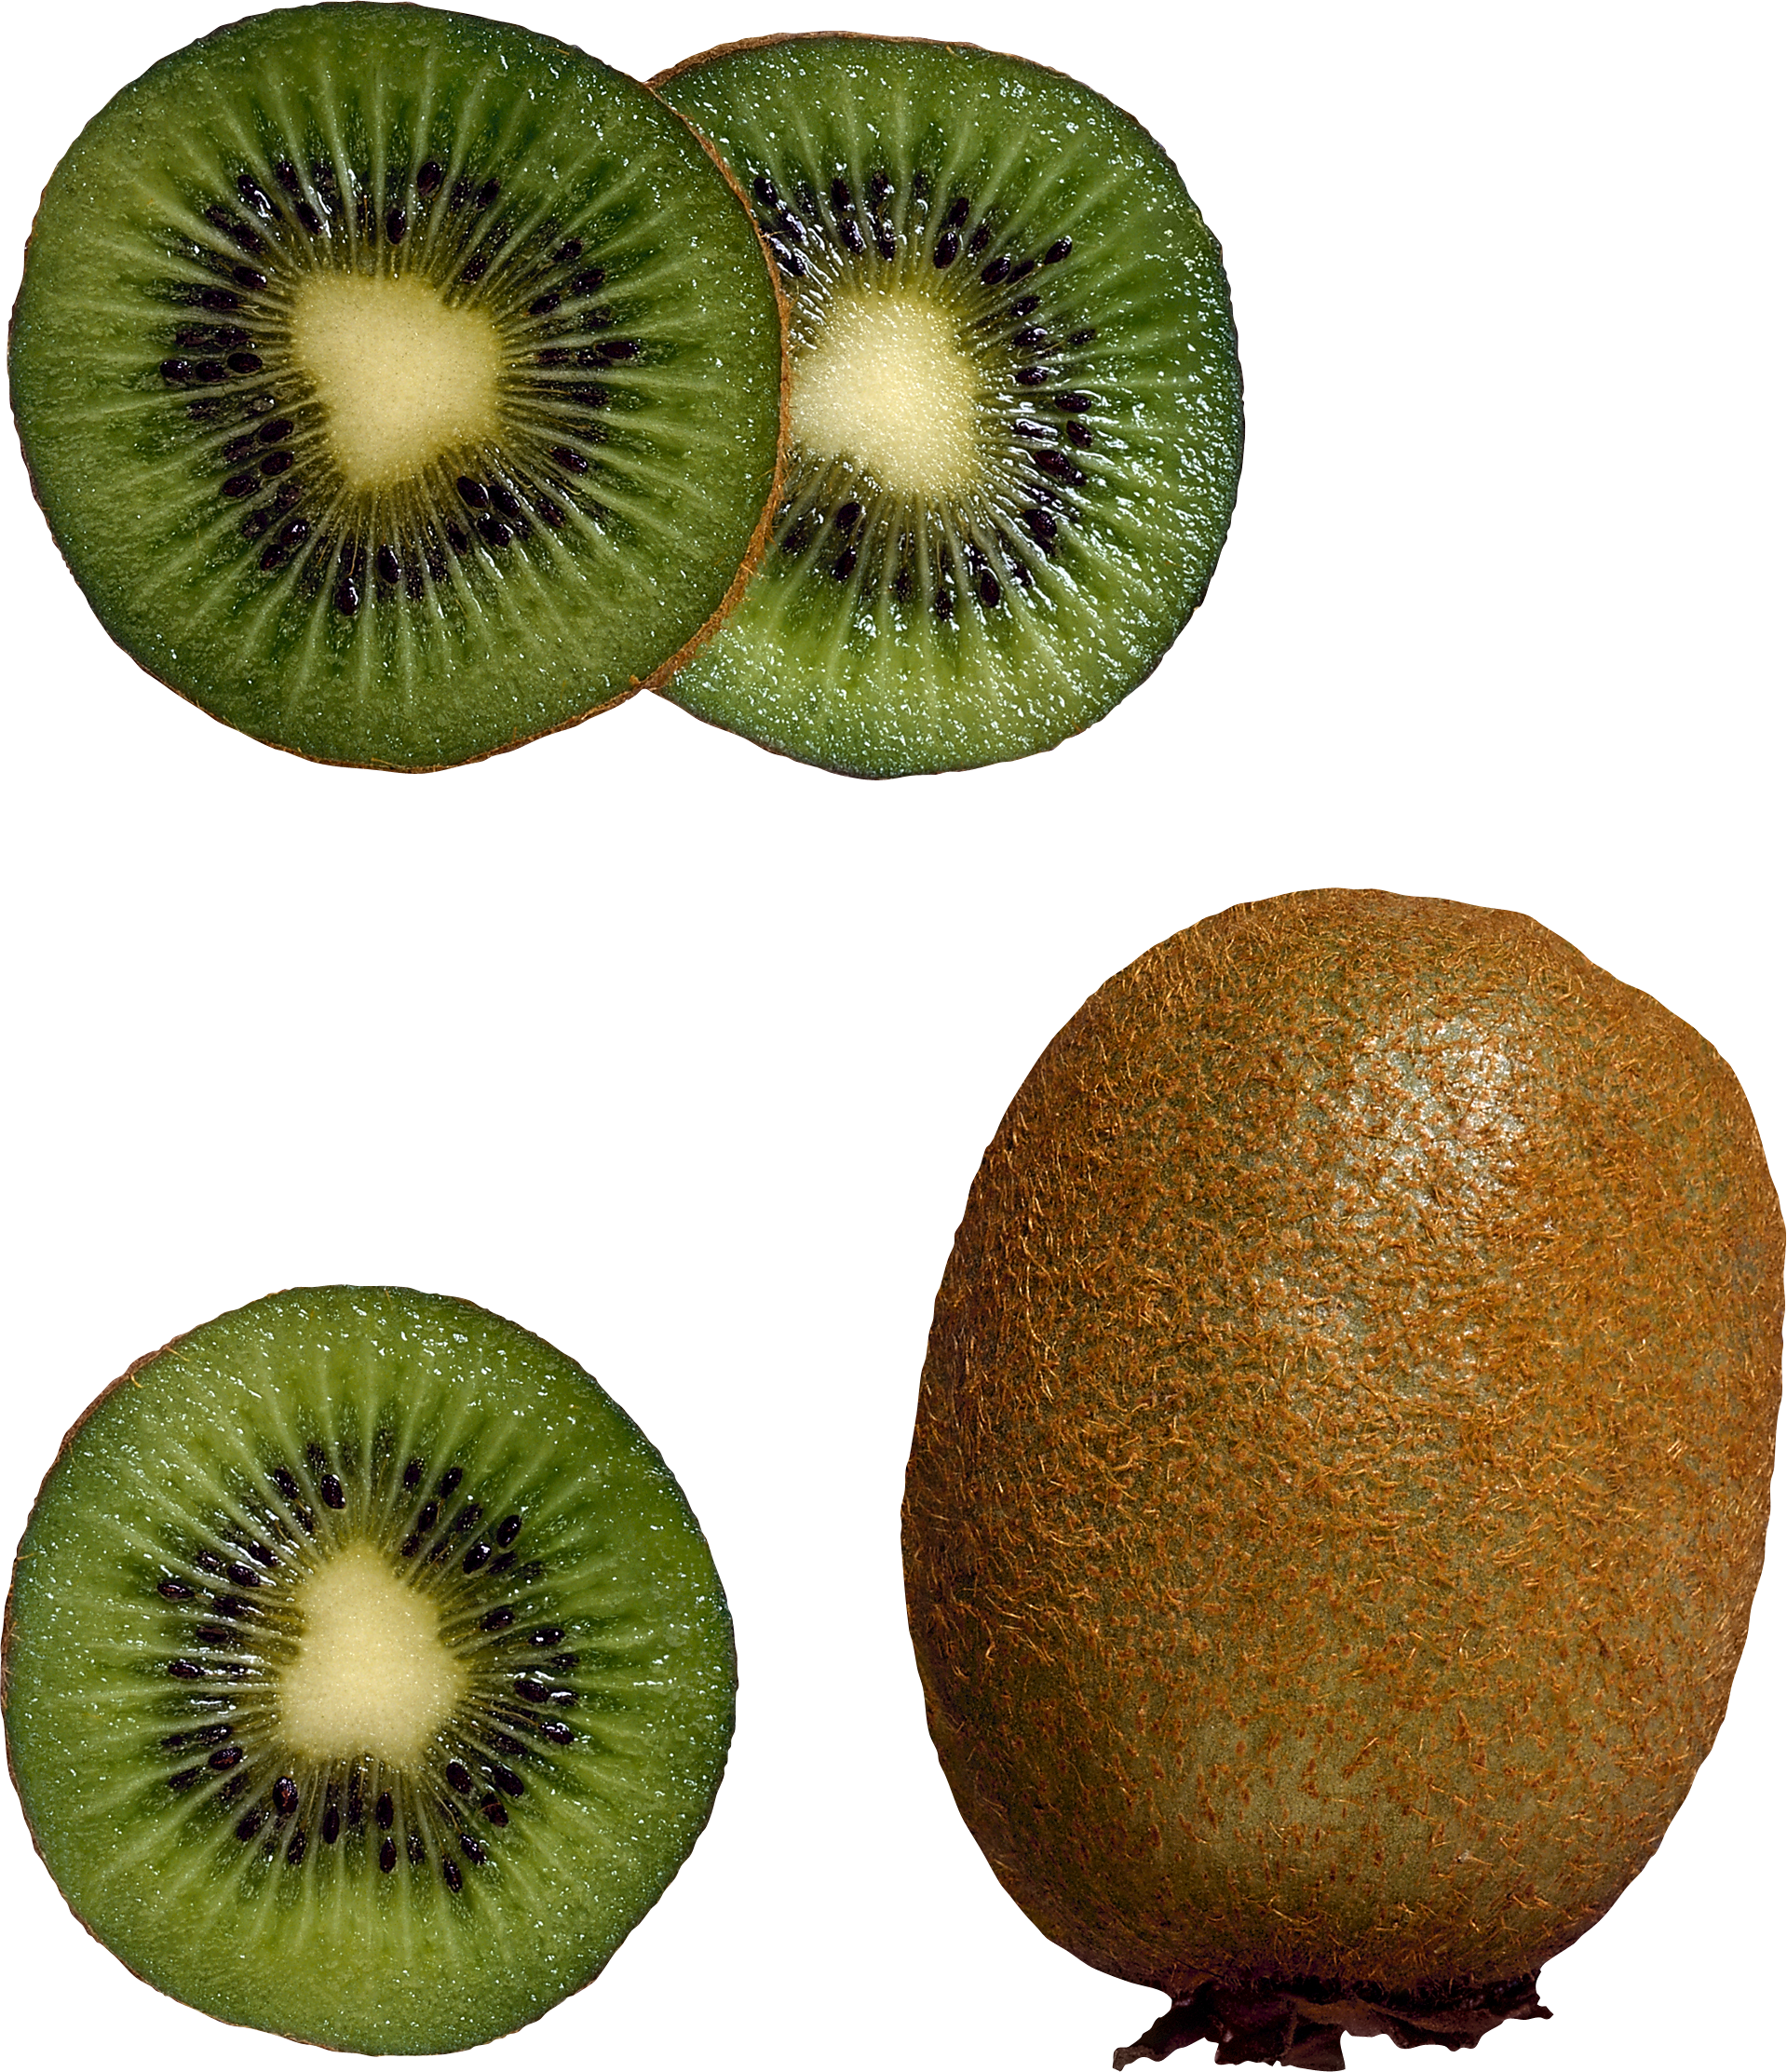 Kiwi clipart transparent background. Png image purepng free